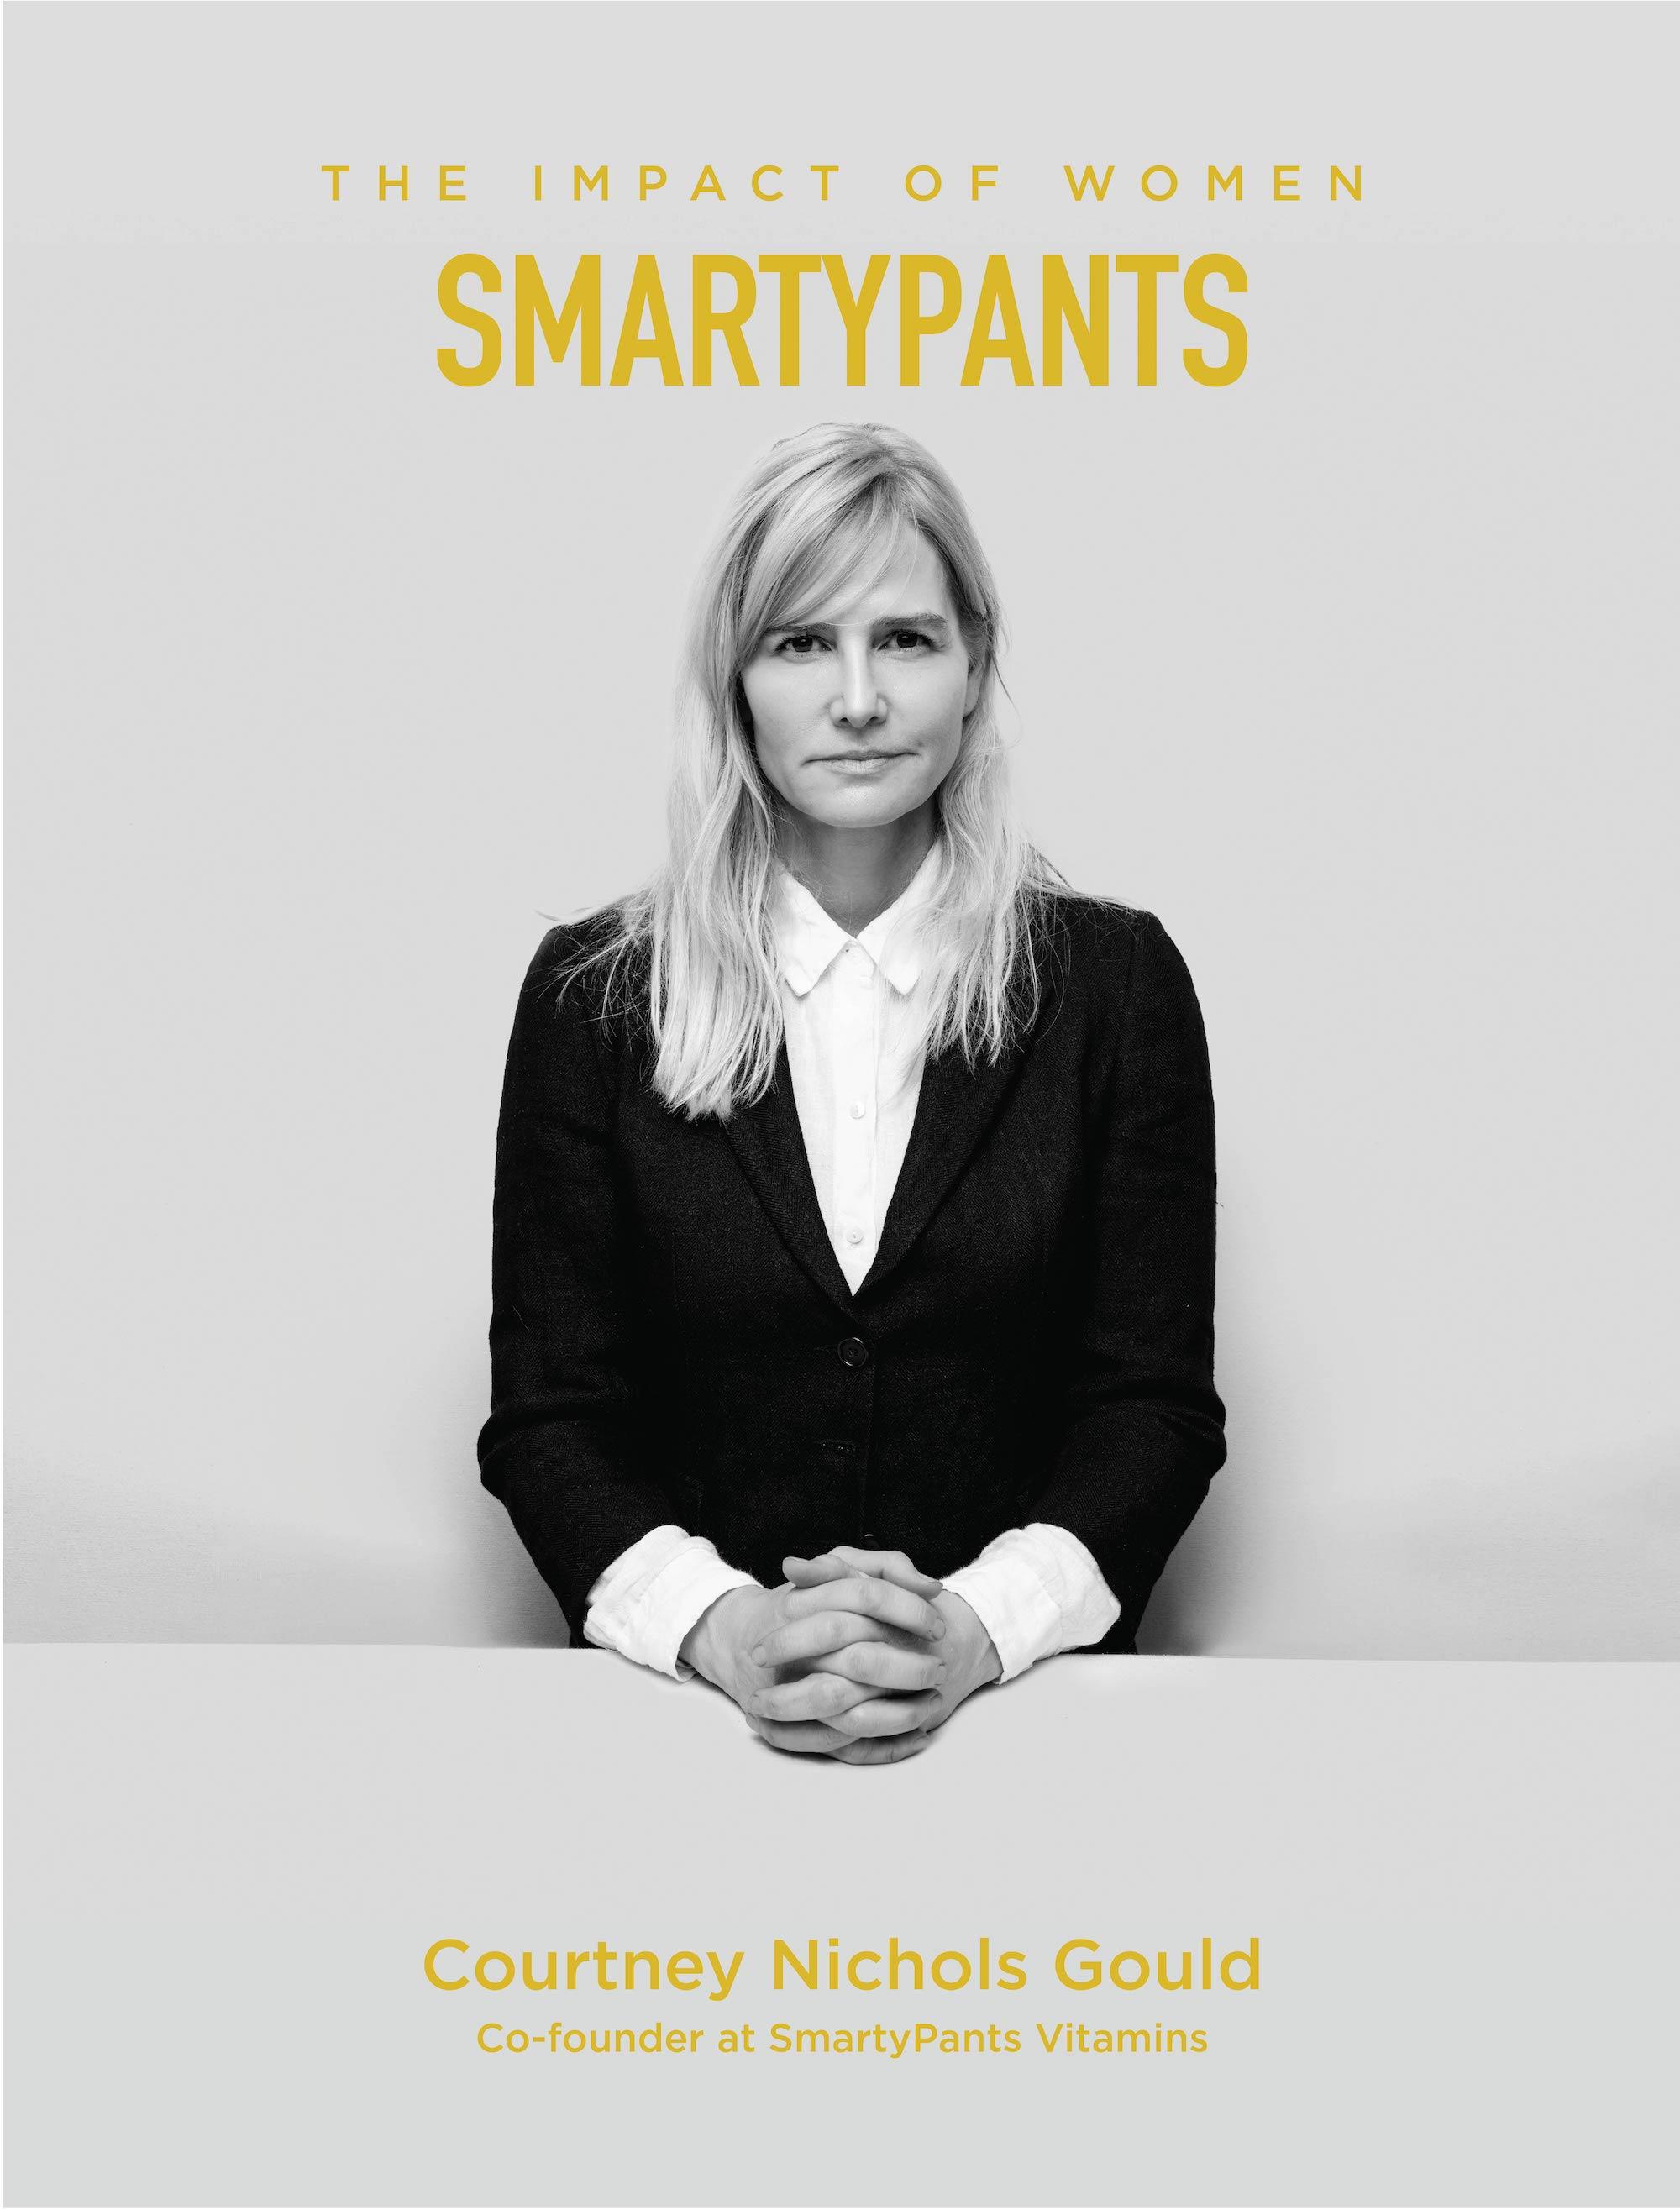 Courtney Nichols Gould is a SmartyPants